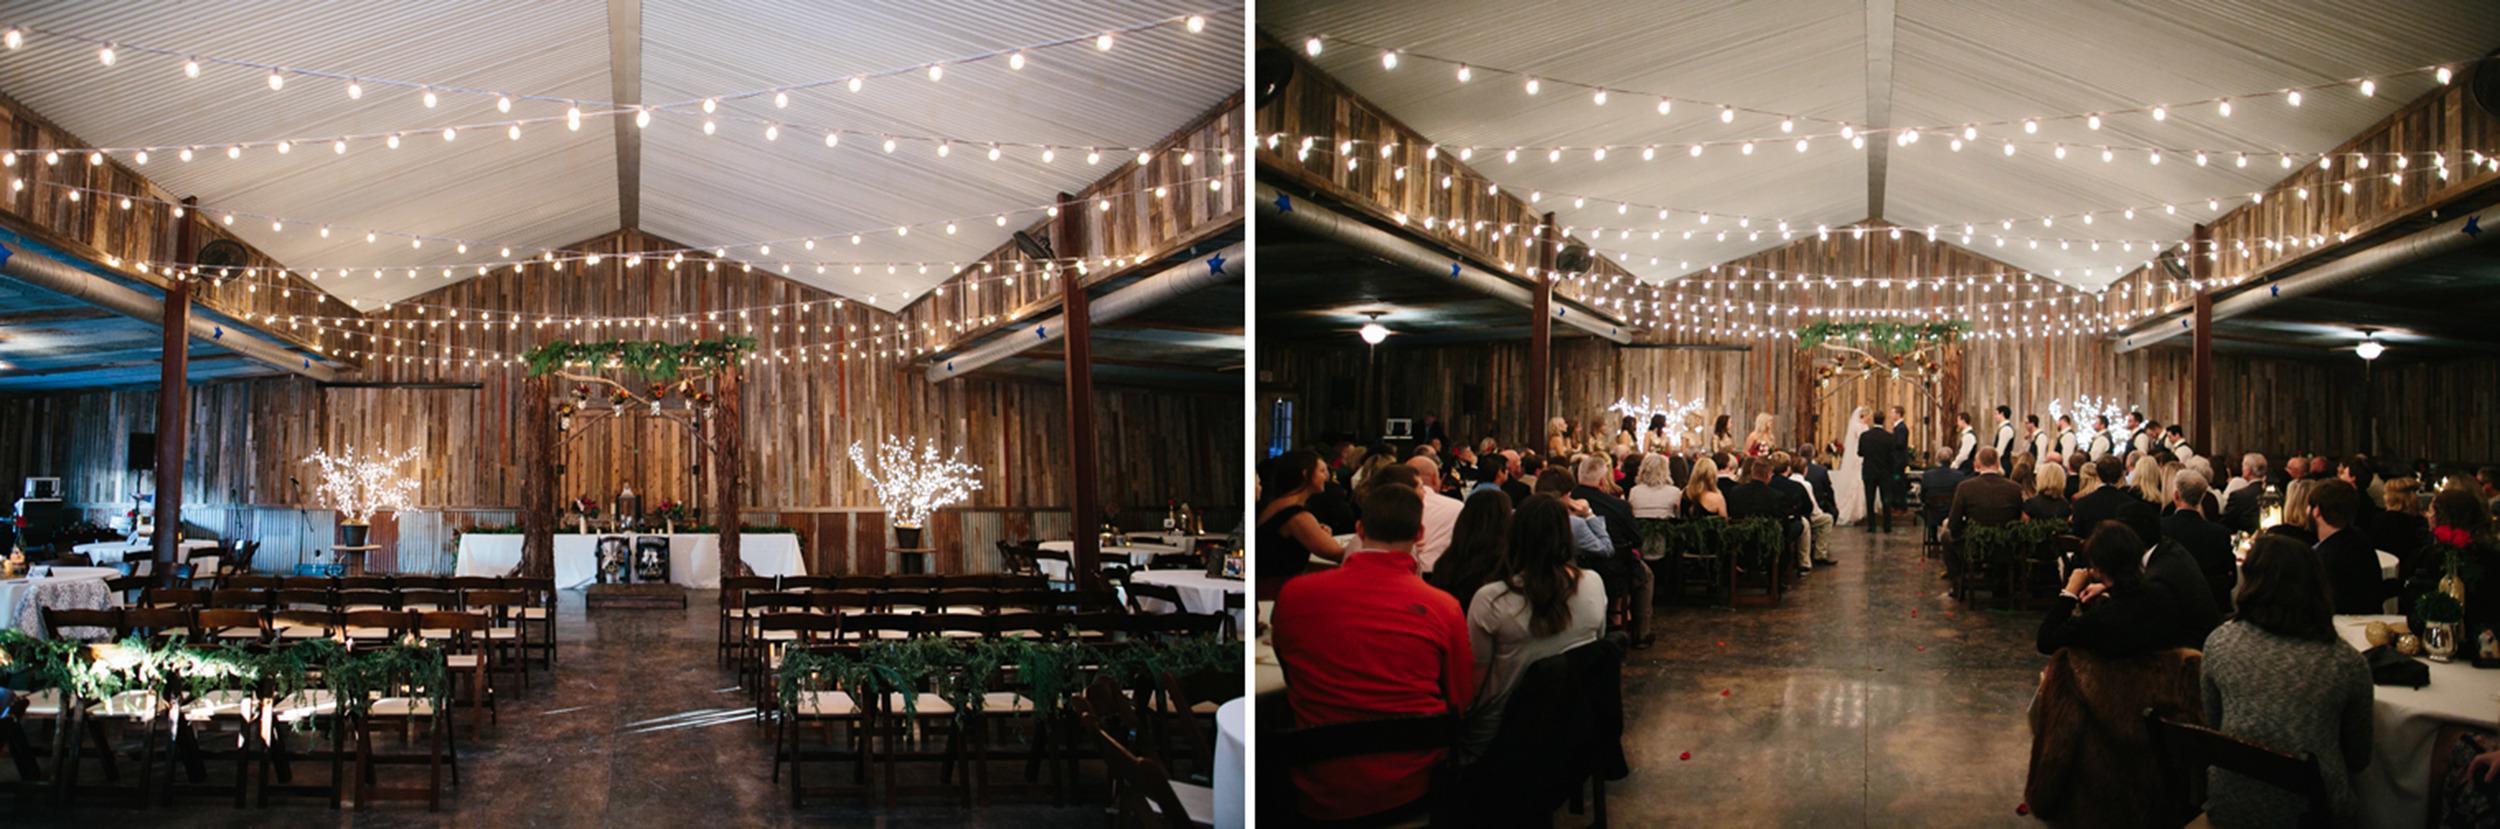 Cotton_Creek_Barn_Winter_Wedding_WeddingPhotographer041.jpg